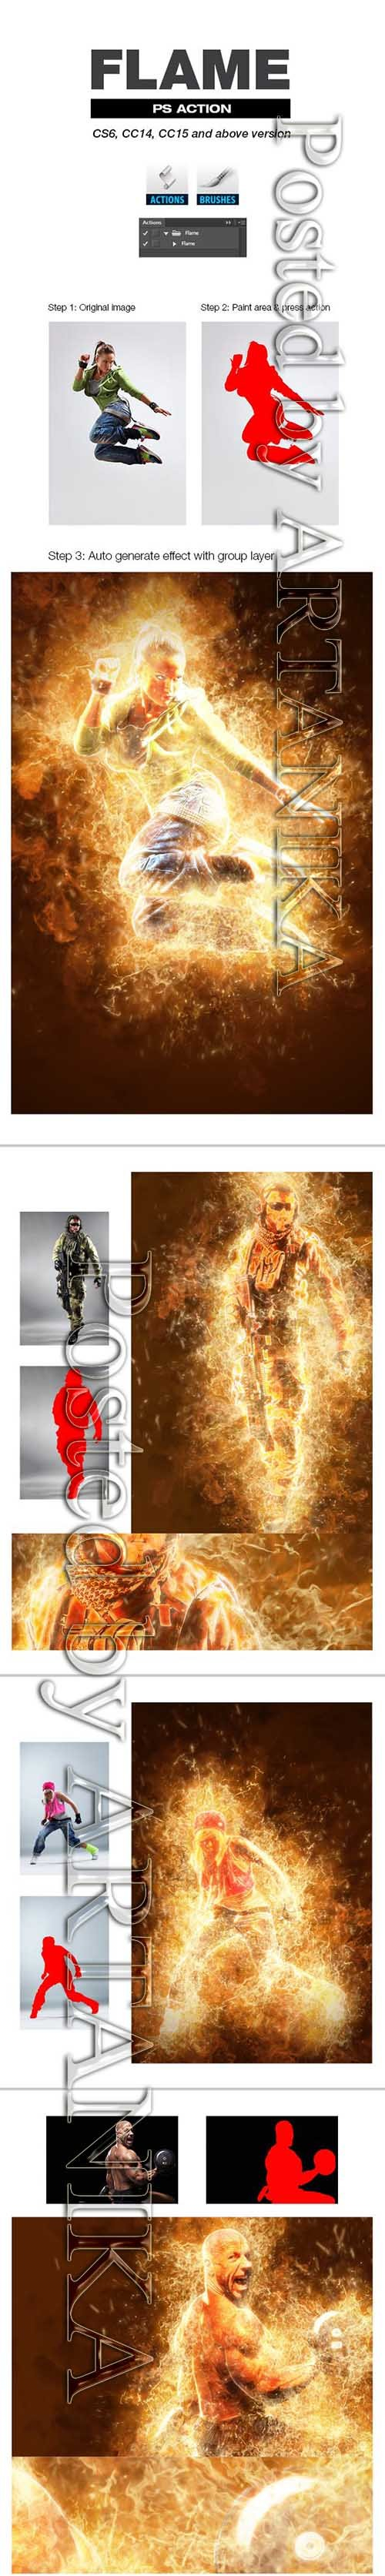 Graphicriver - Flame 21290449